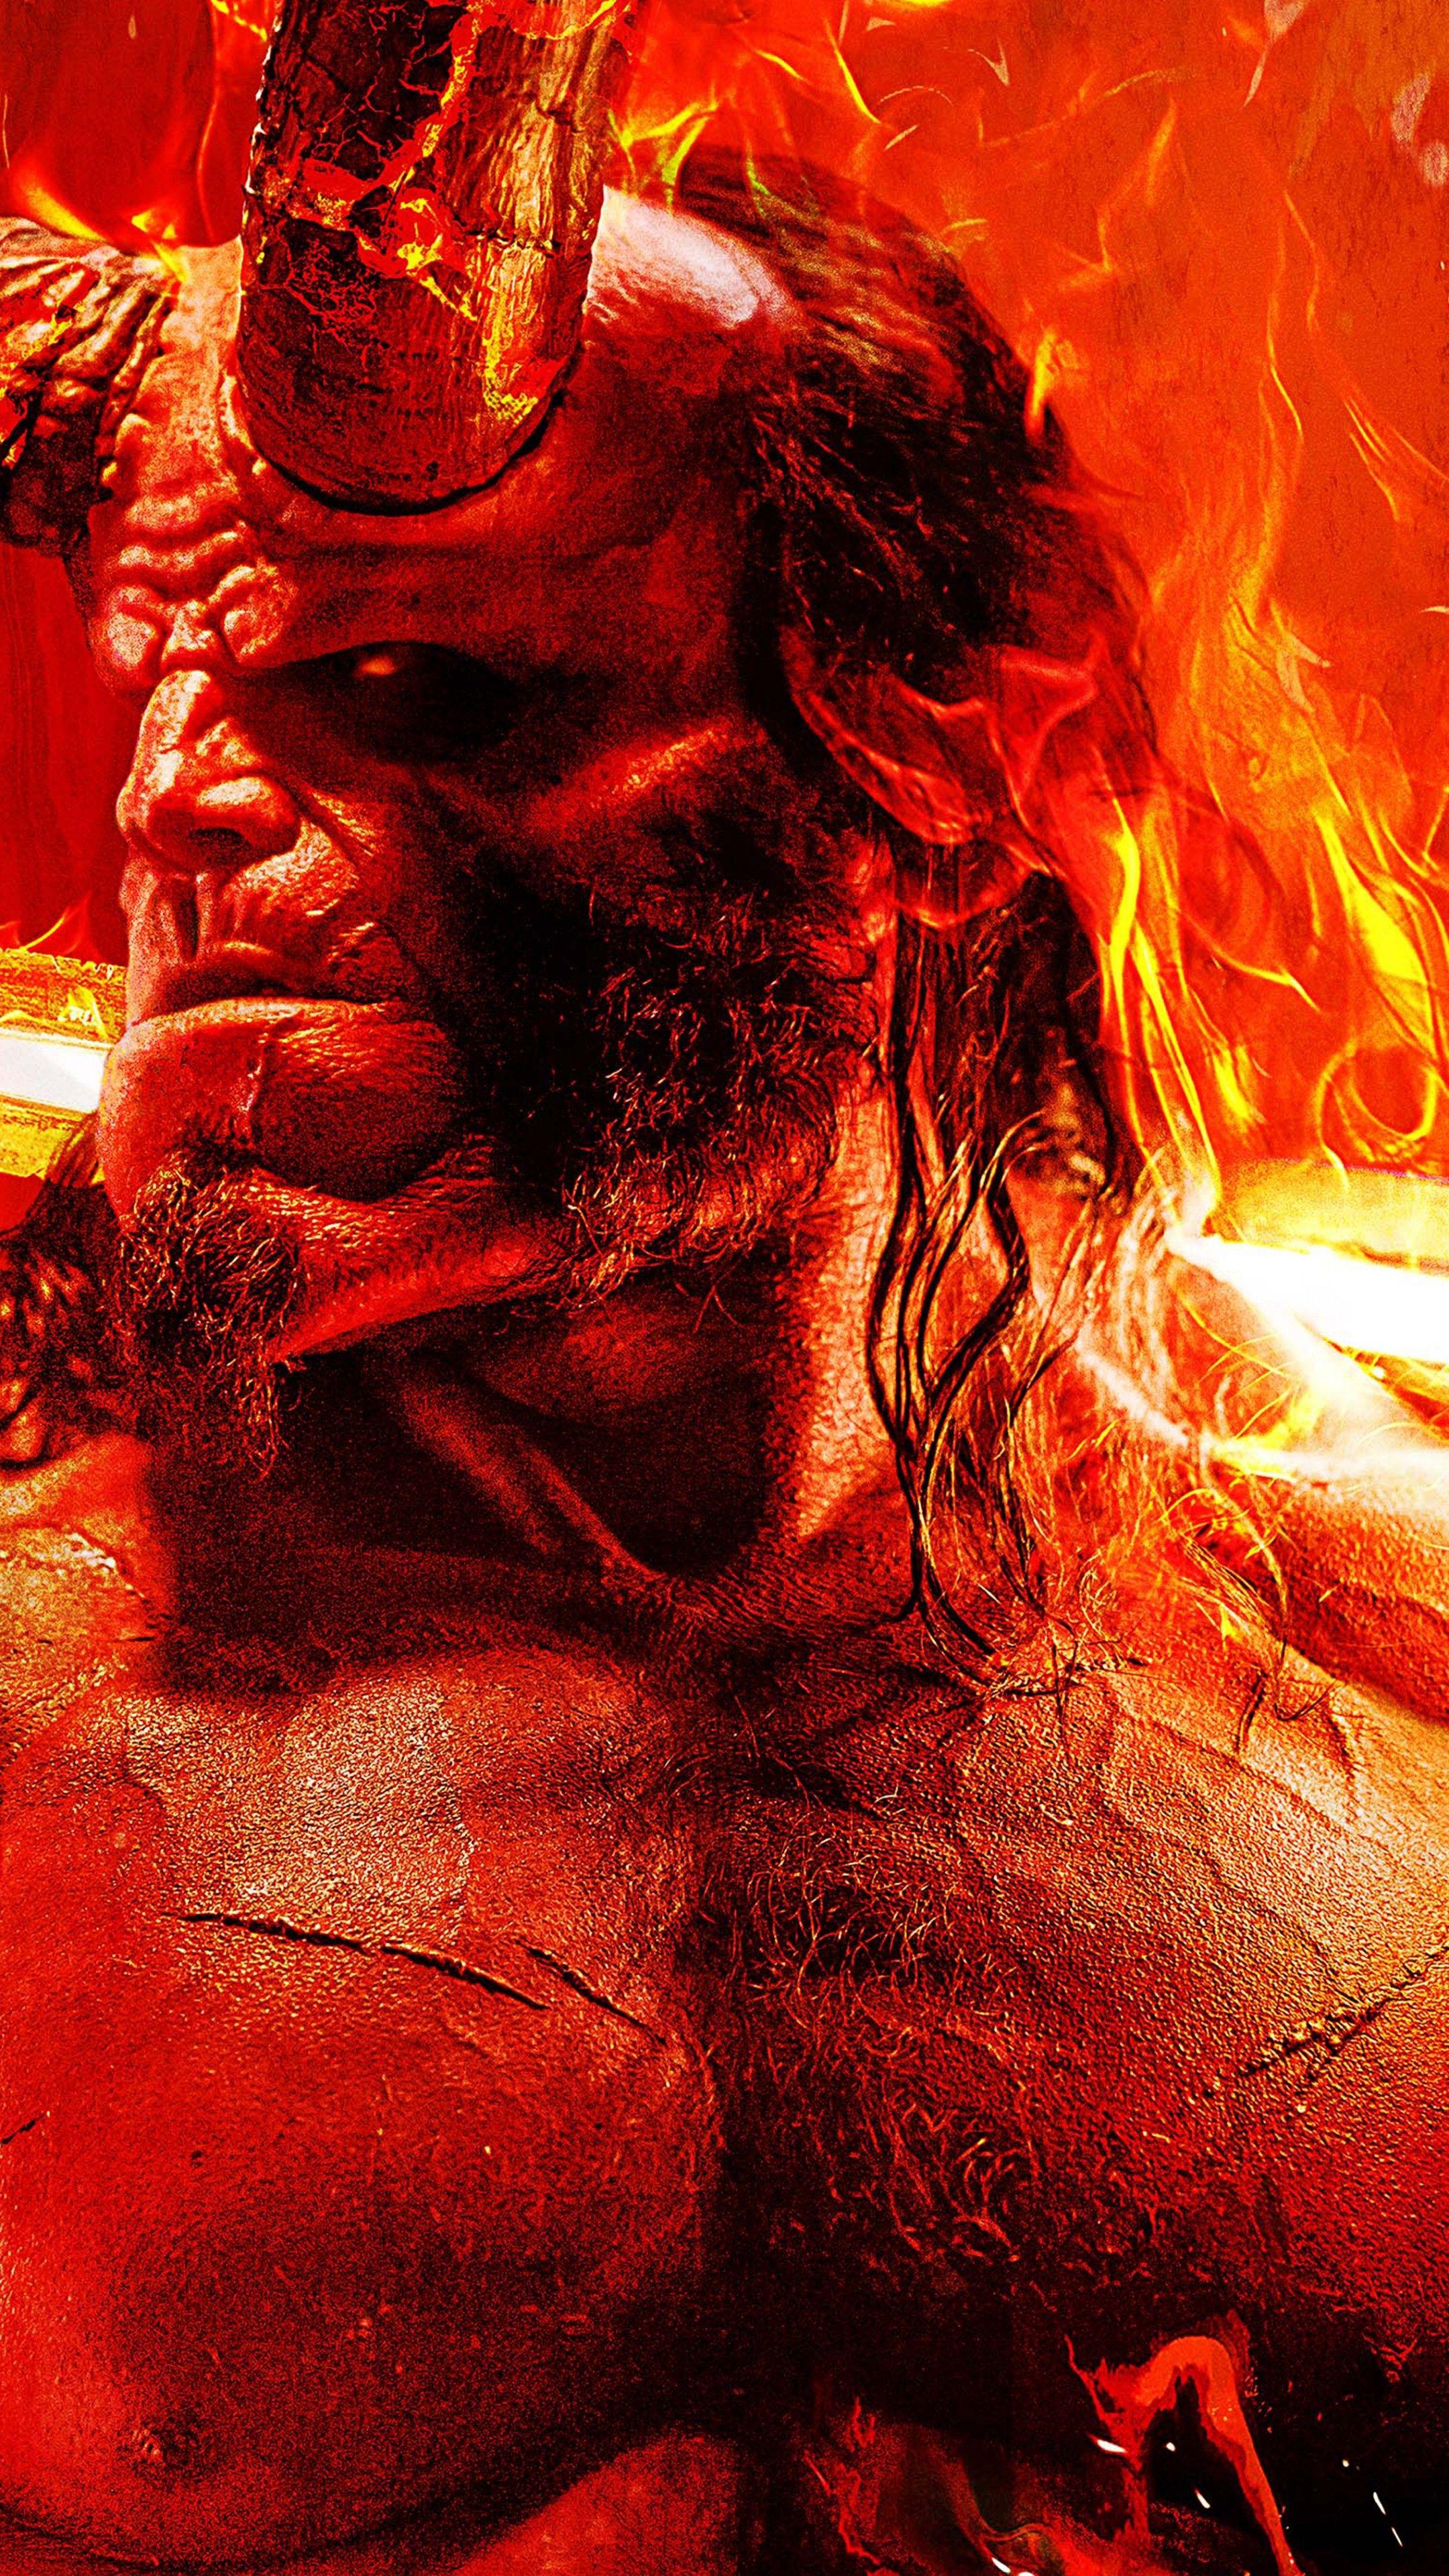 Hellboy Http Www Wallpaperback Net Movies Hellboy Html 5k David Harbour Poster Hellboy Movie Hellboy Wallpaper Movie Wallpapers